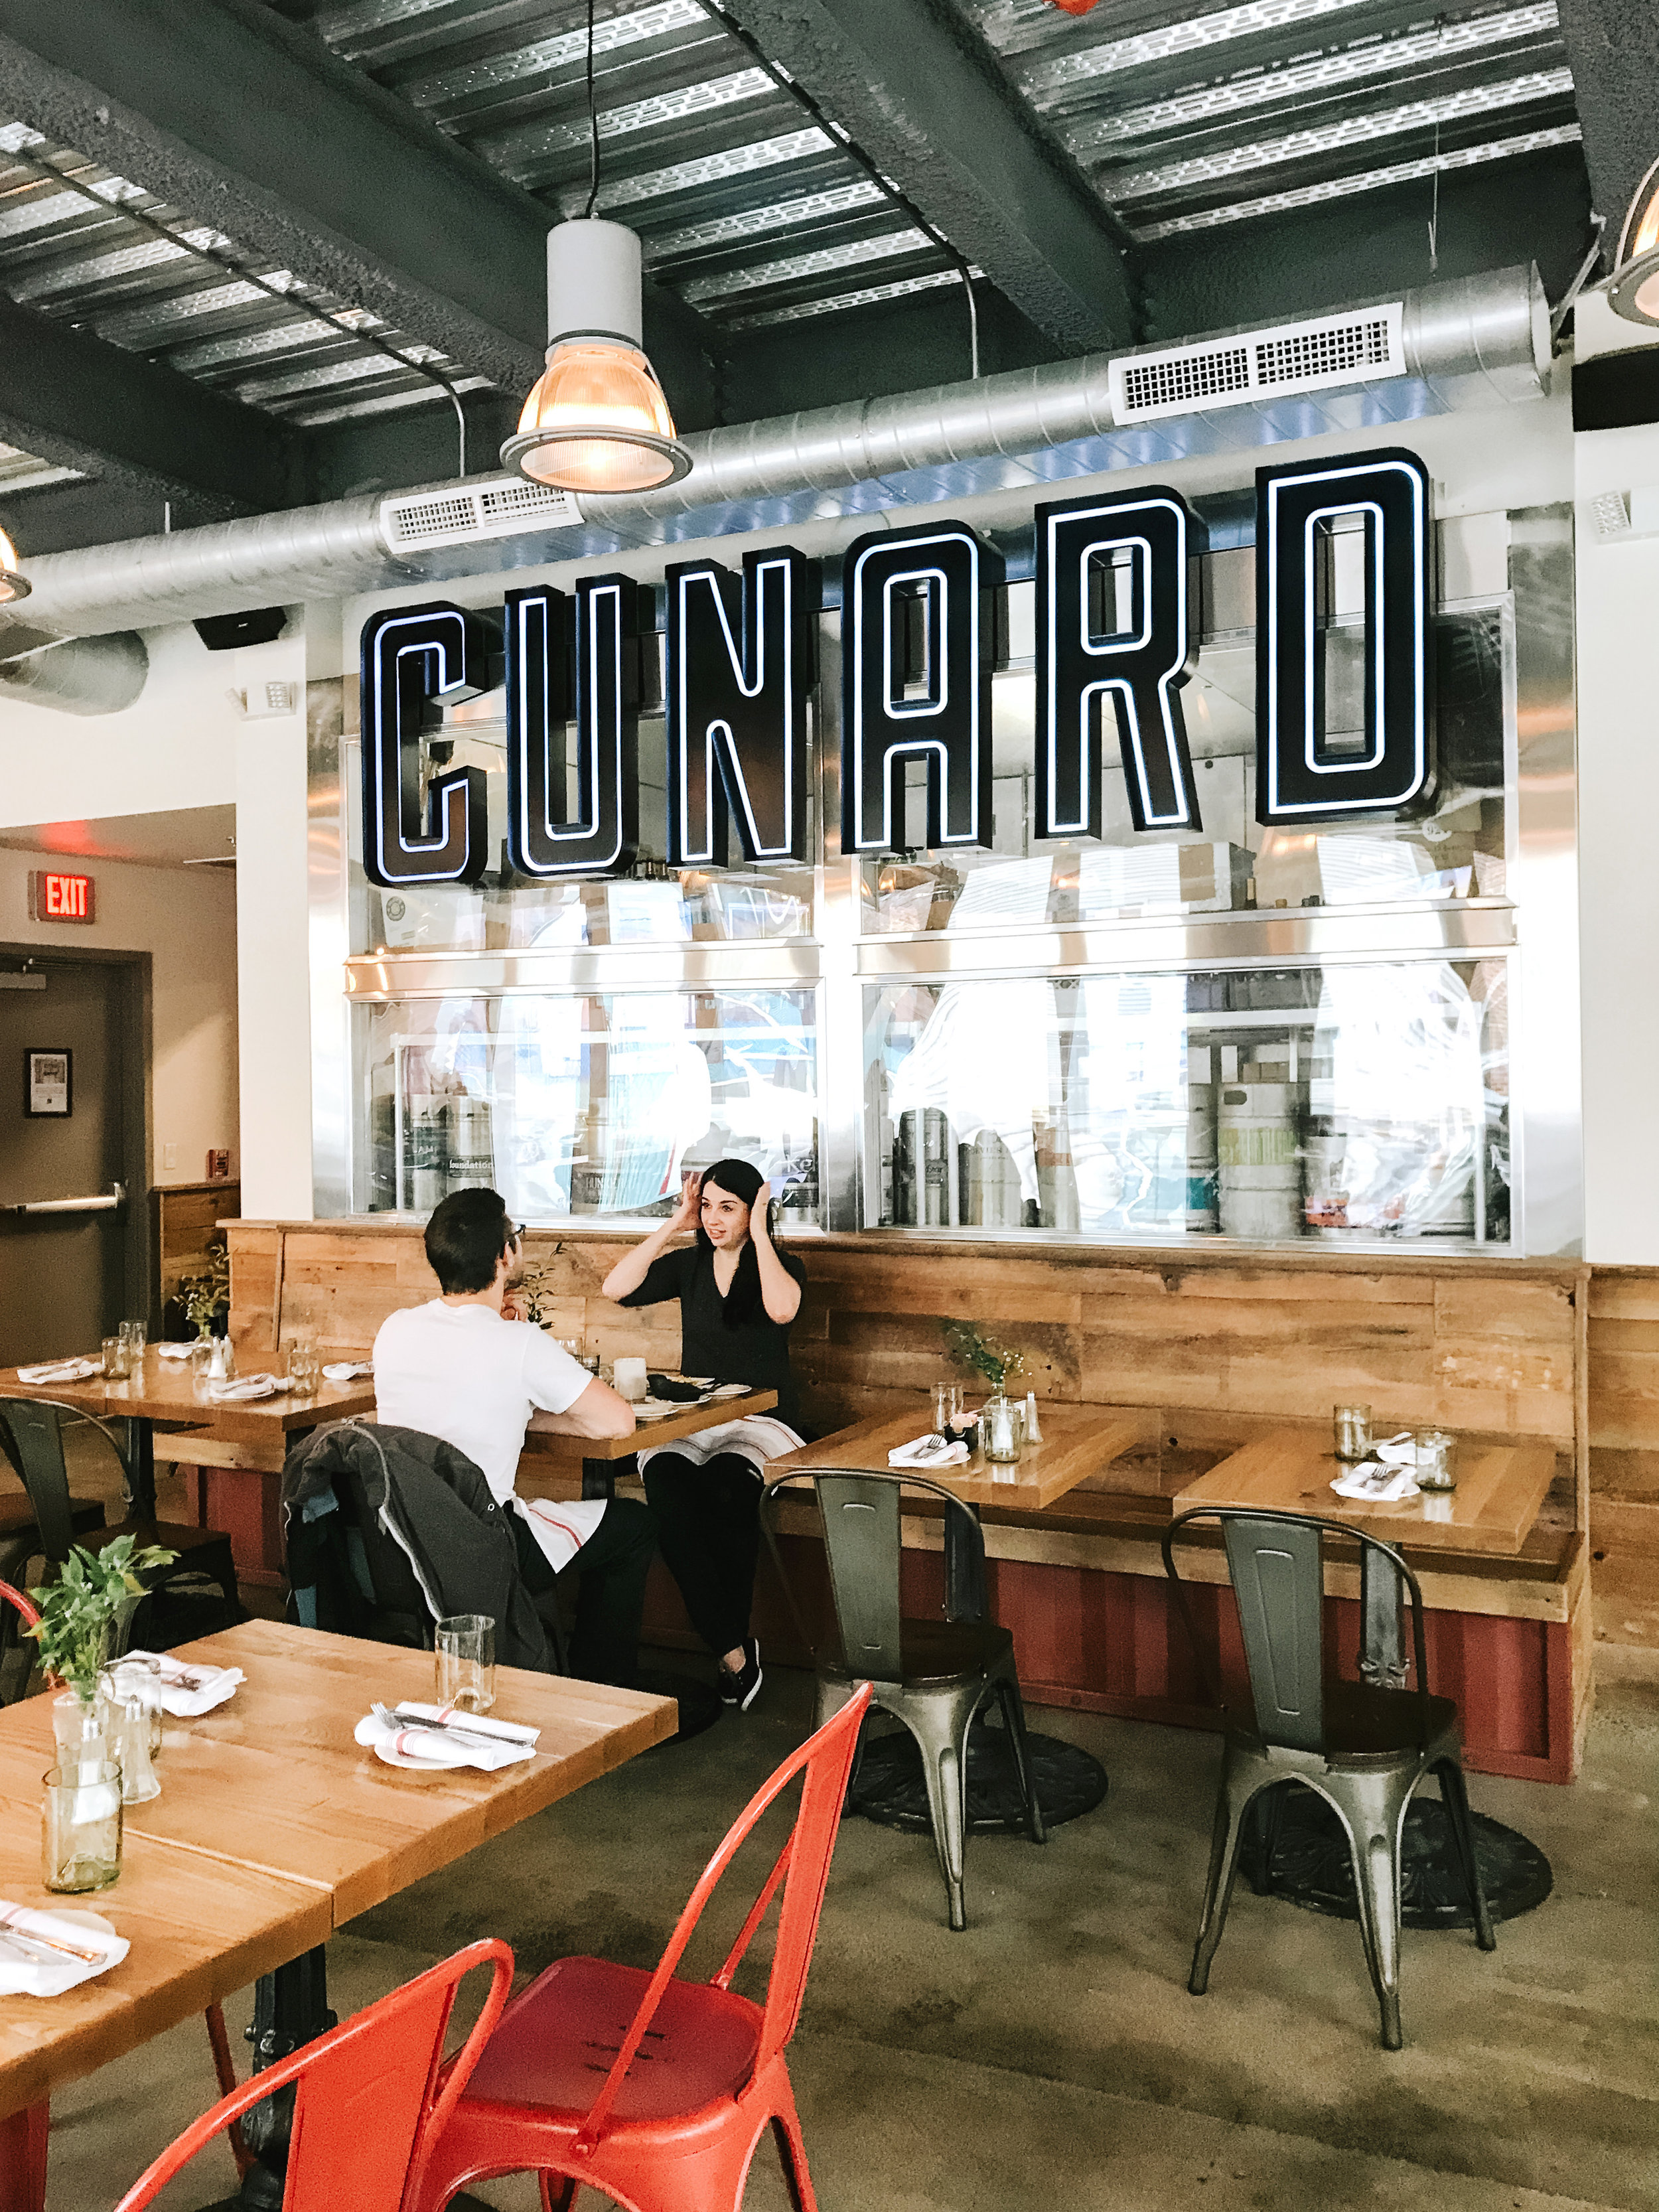 cunard-tavern-east-boston-brunch-1.JPG